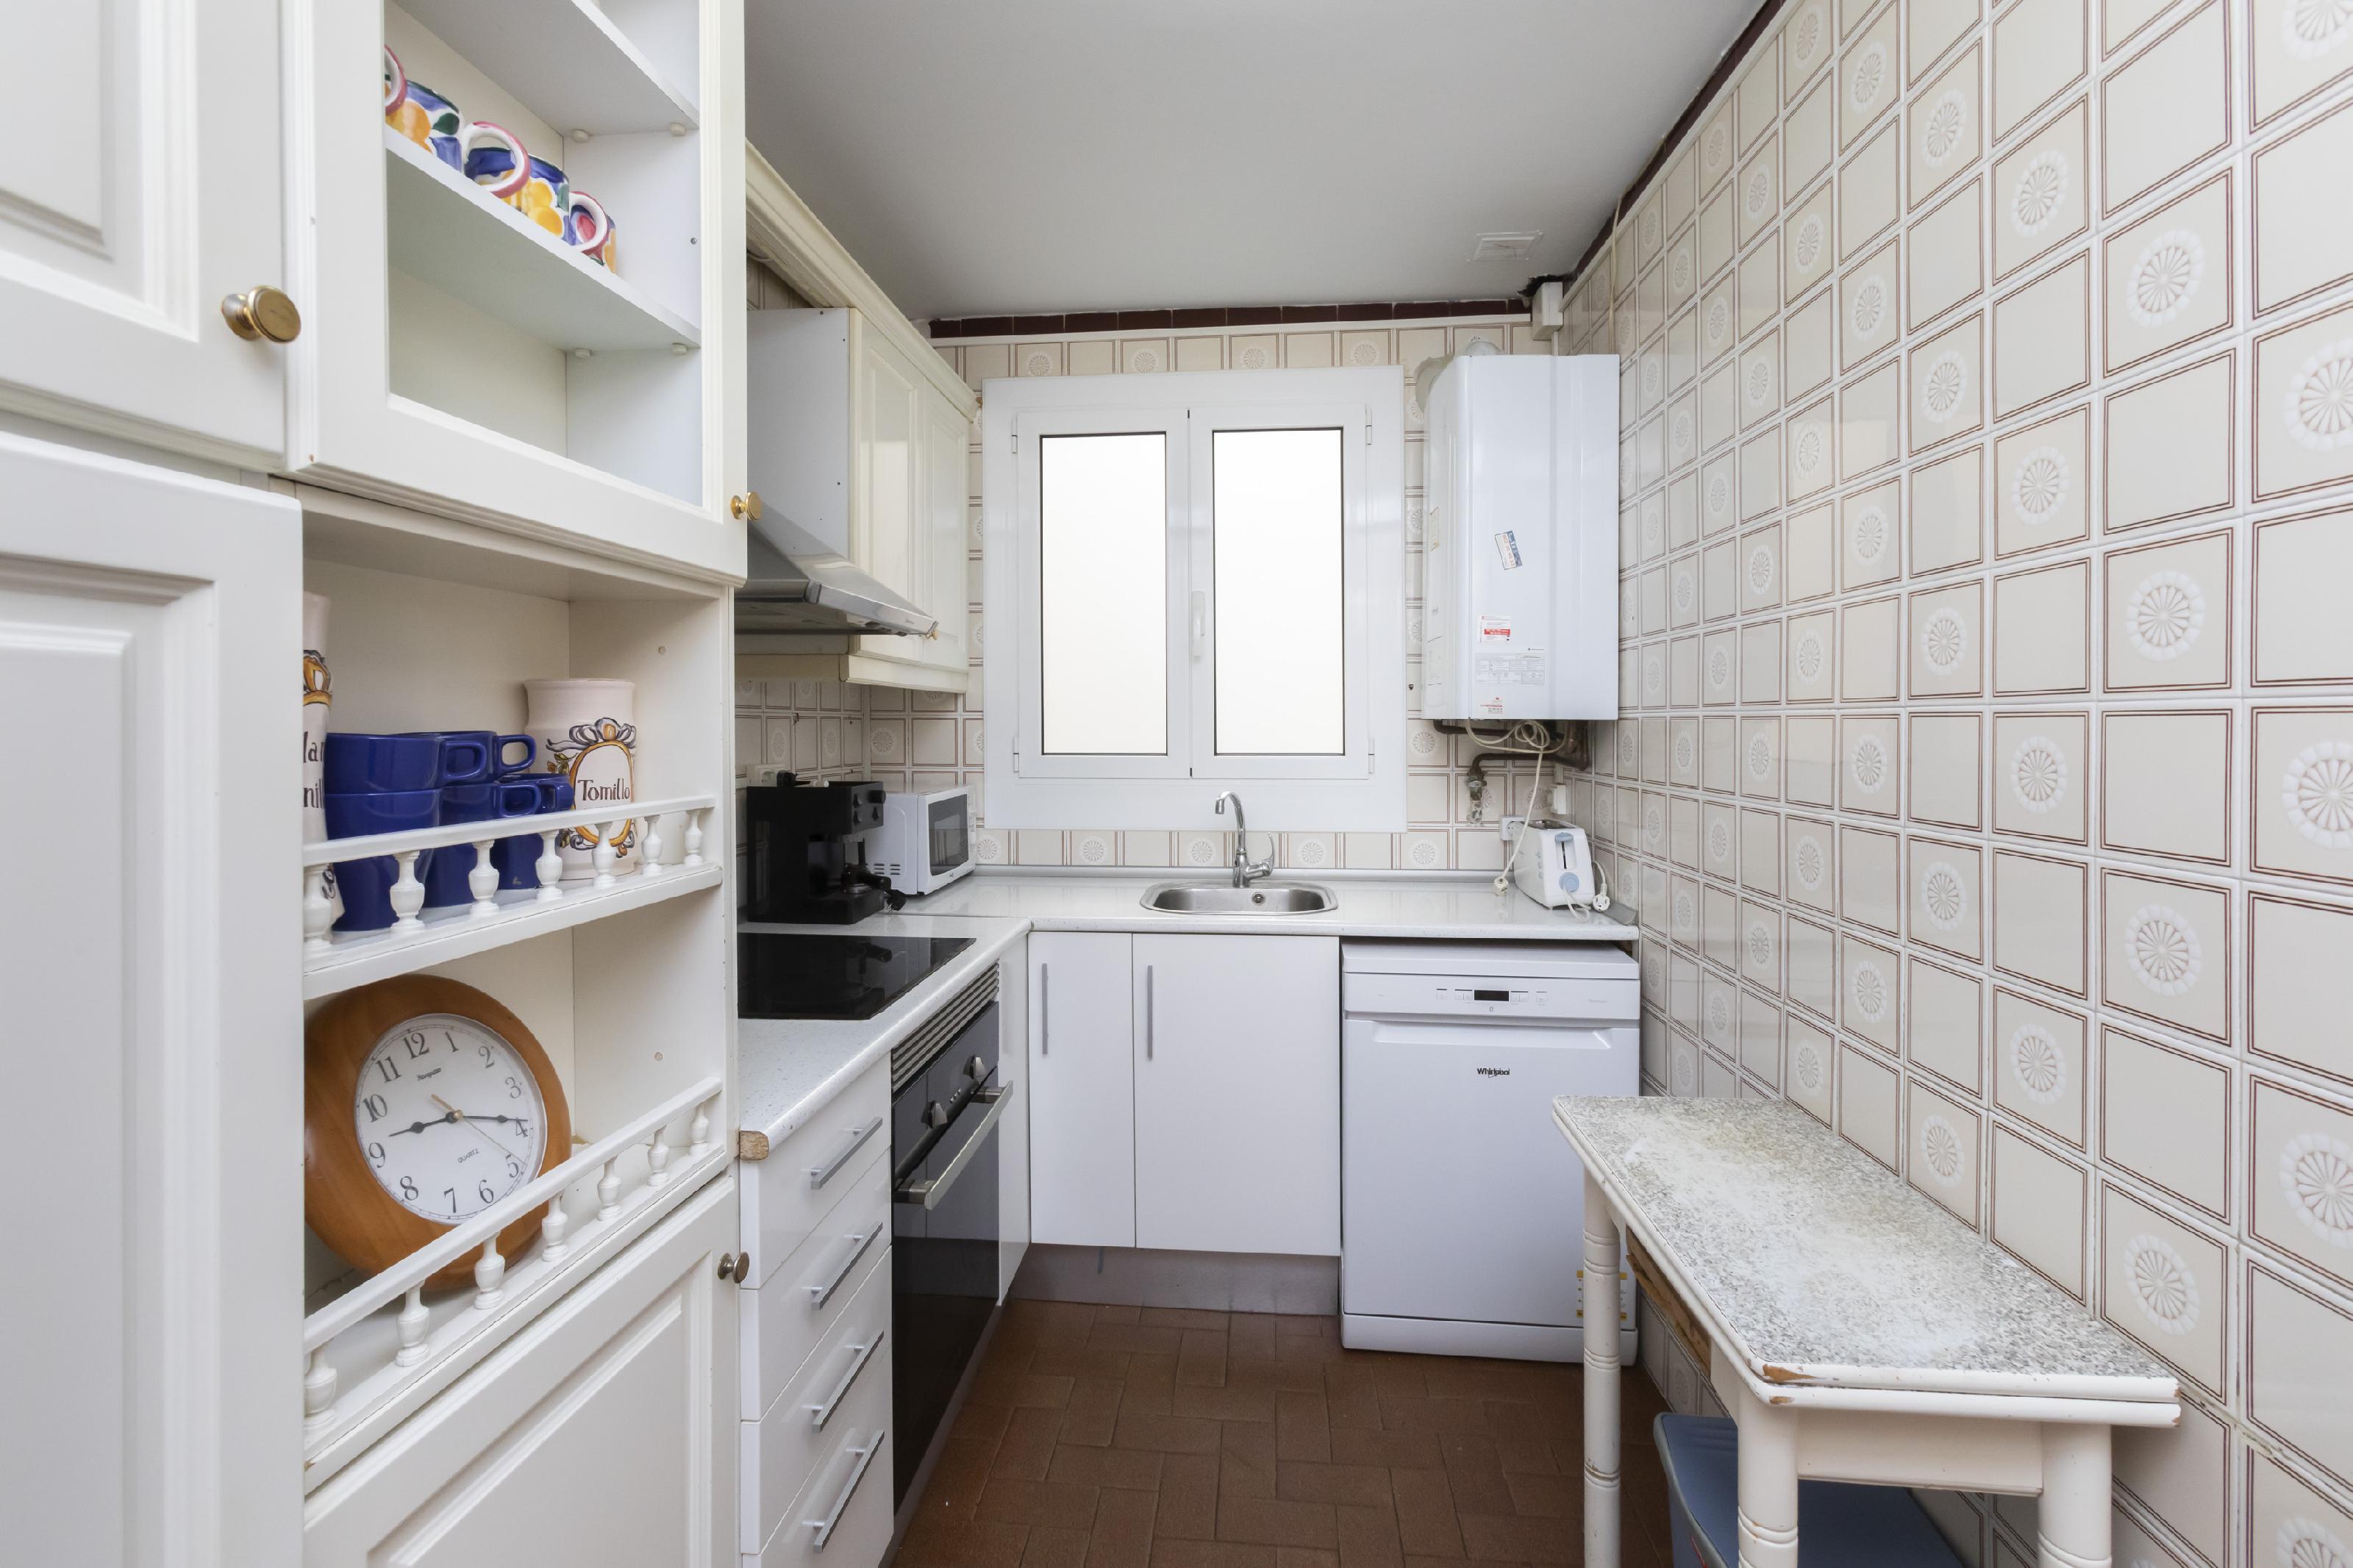 247097 Flat for sale in Sarrià-Sant Gervasi, Sant Gervasi-Galvany 13